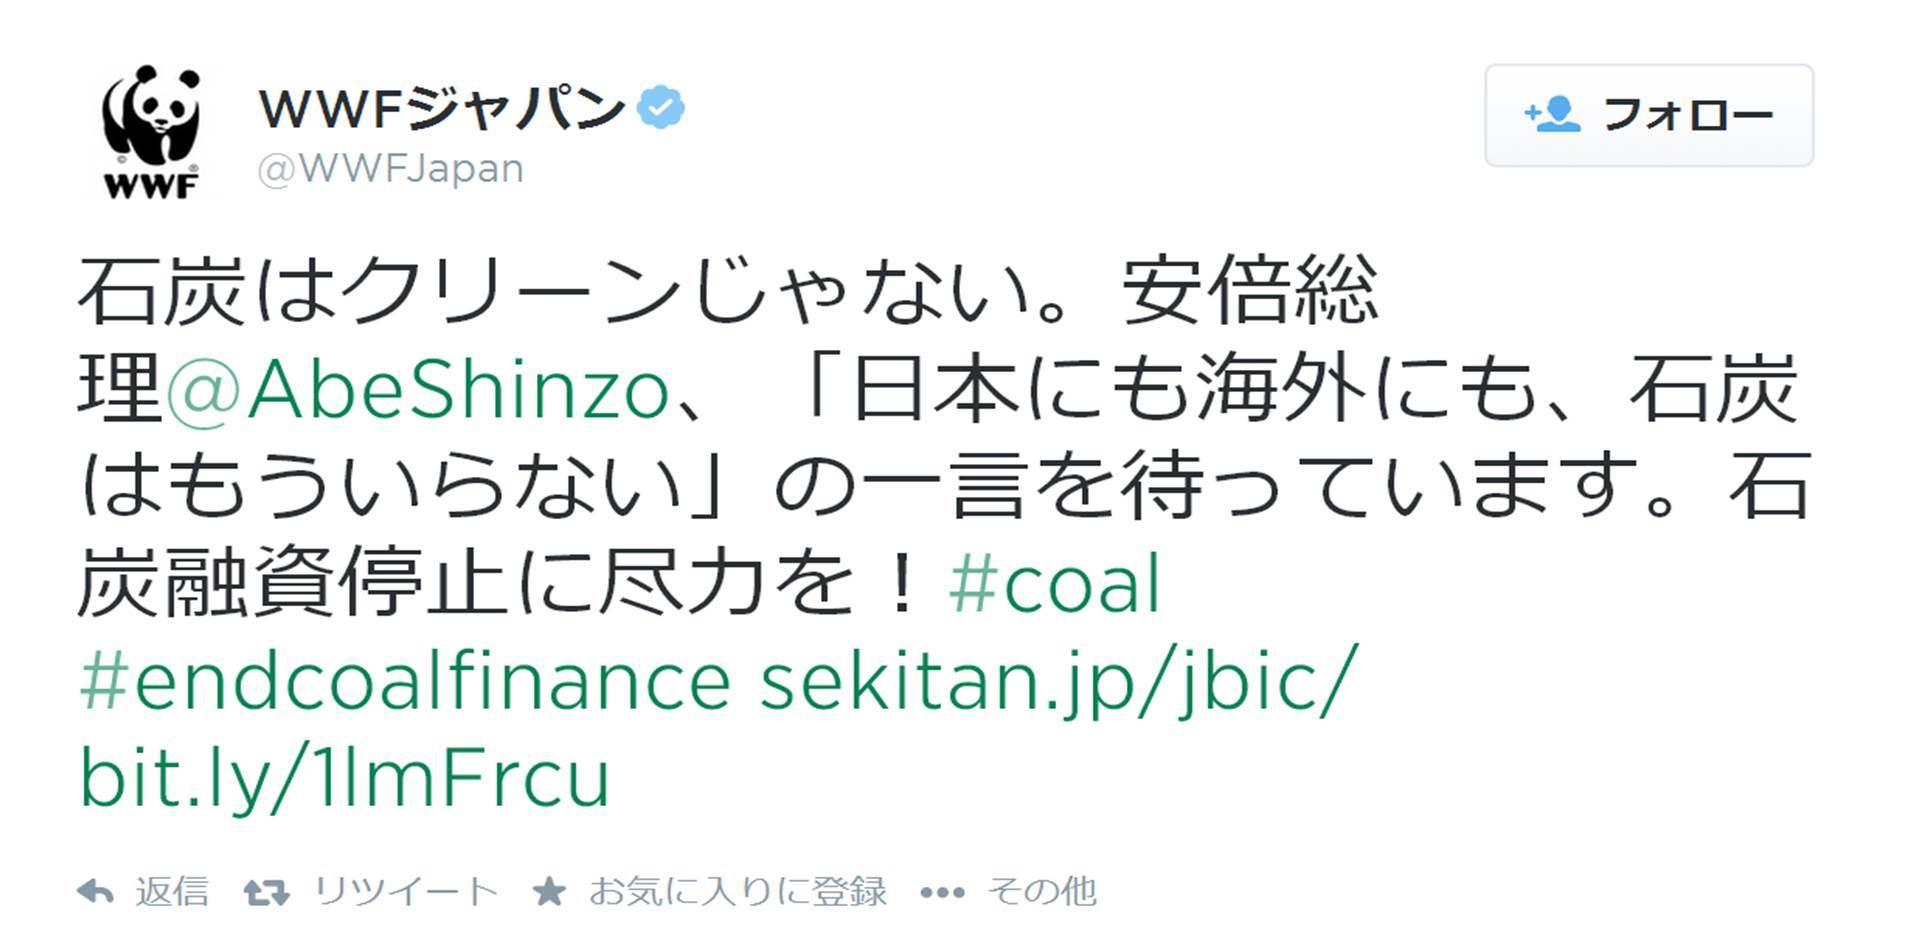 twitteraction_WWFJapan